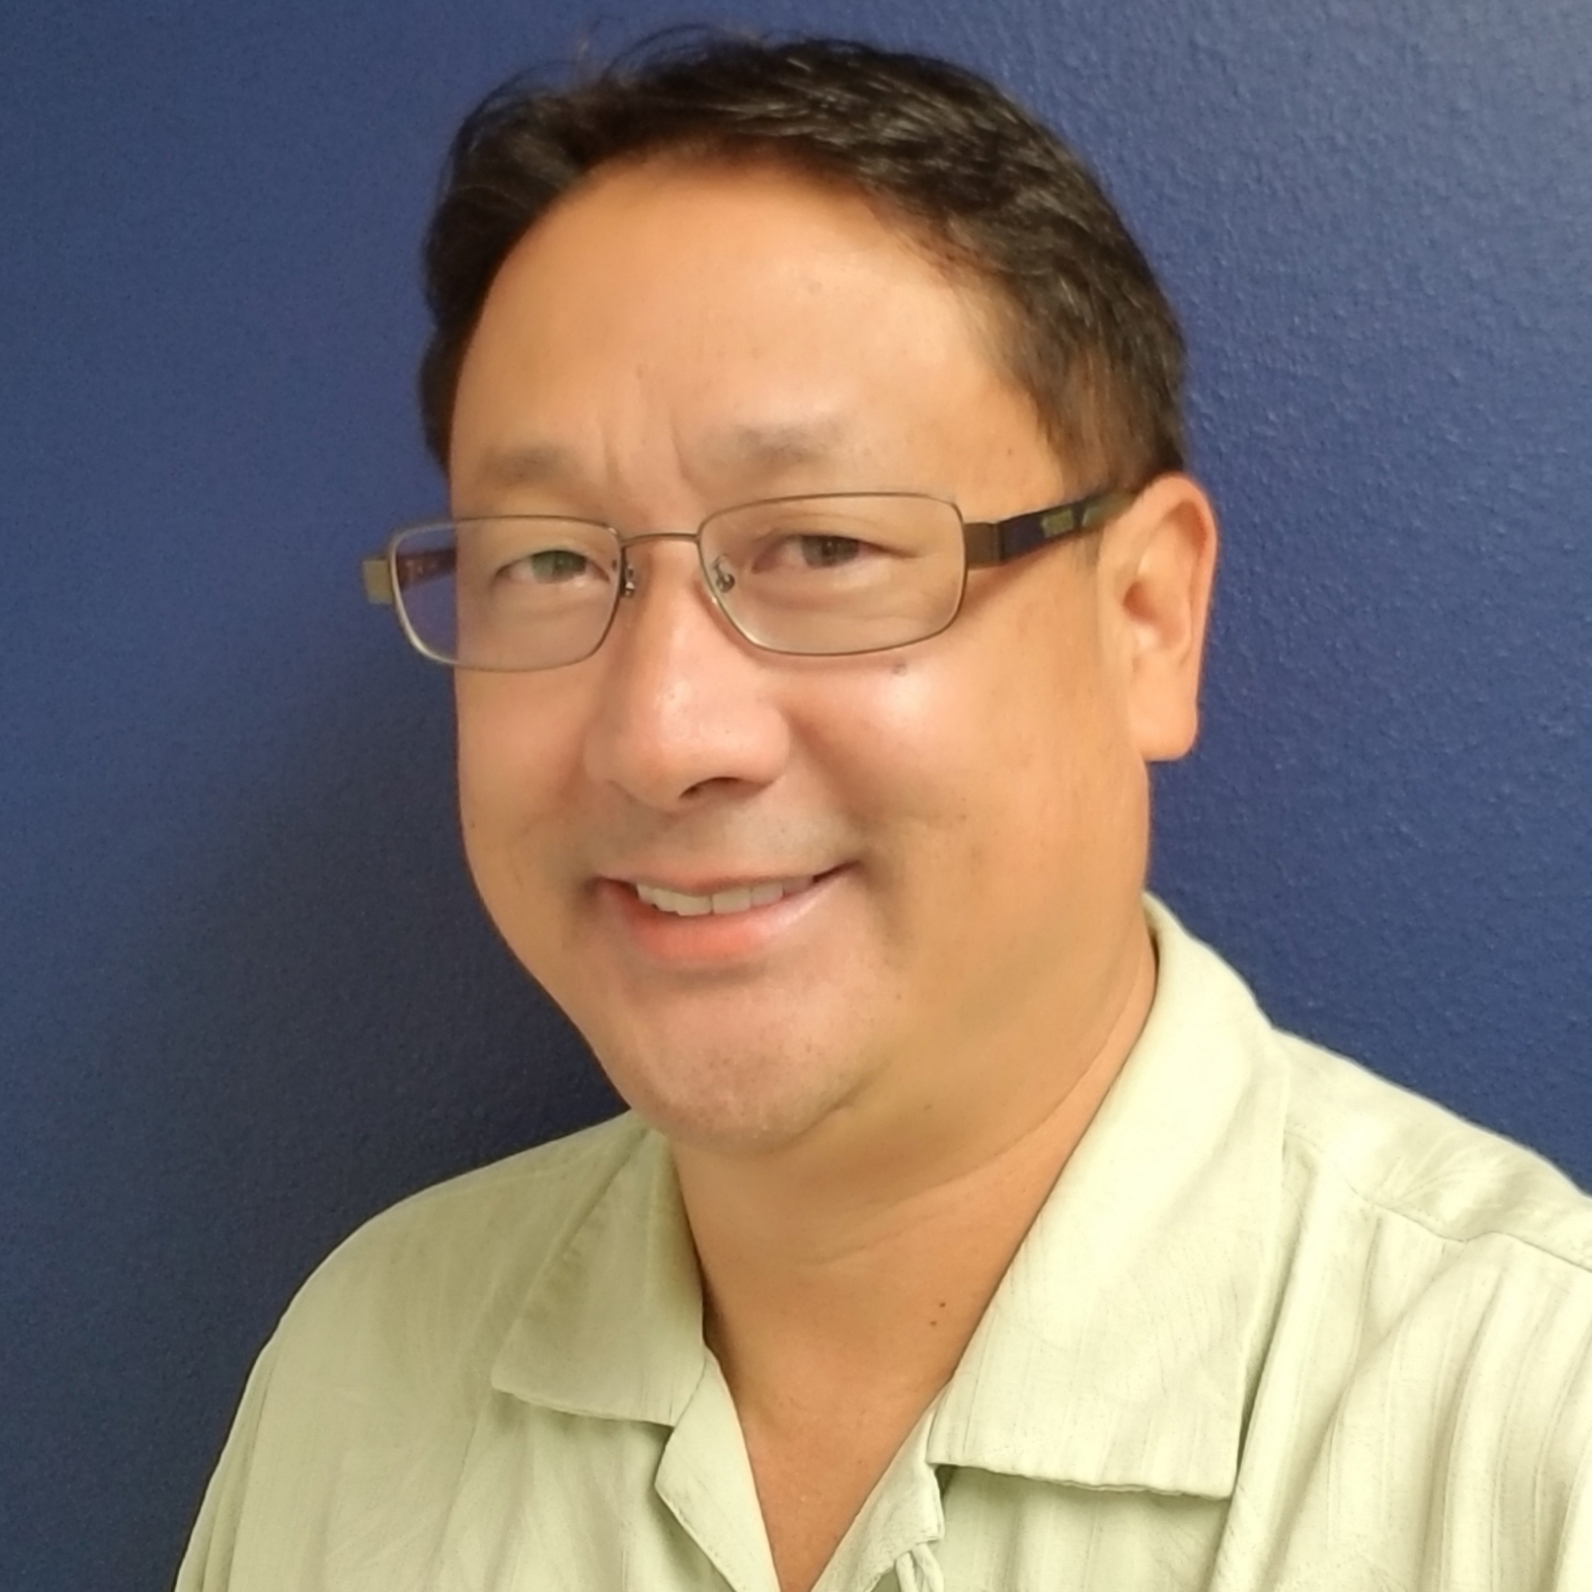 Glenn M. Takase